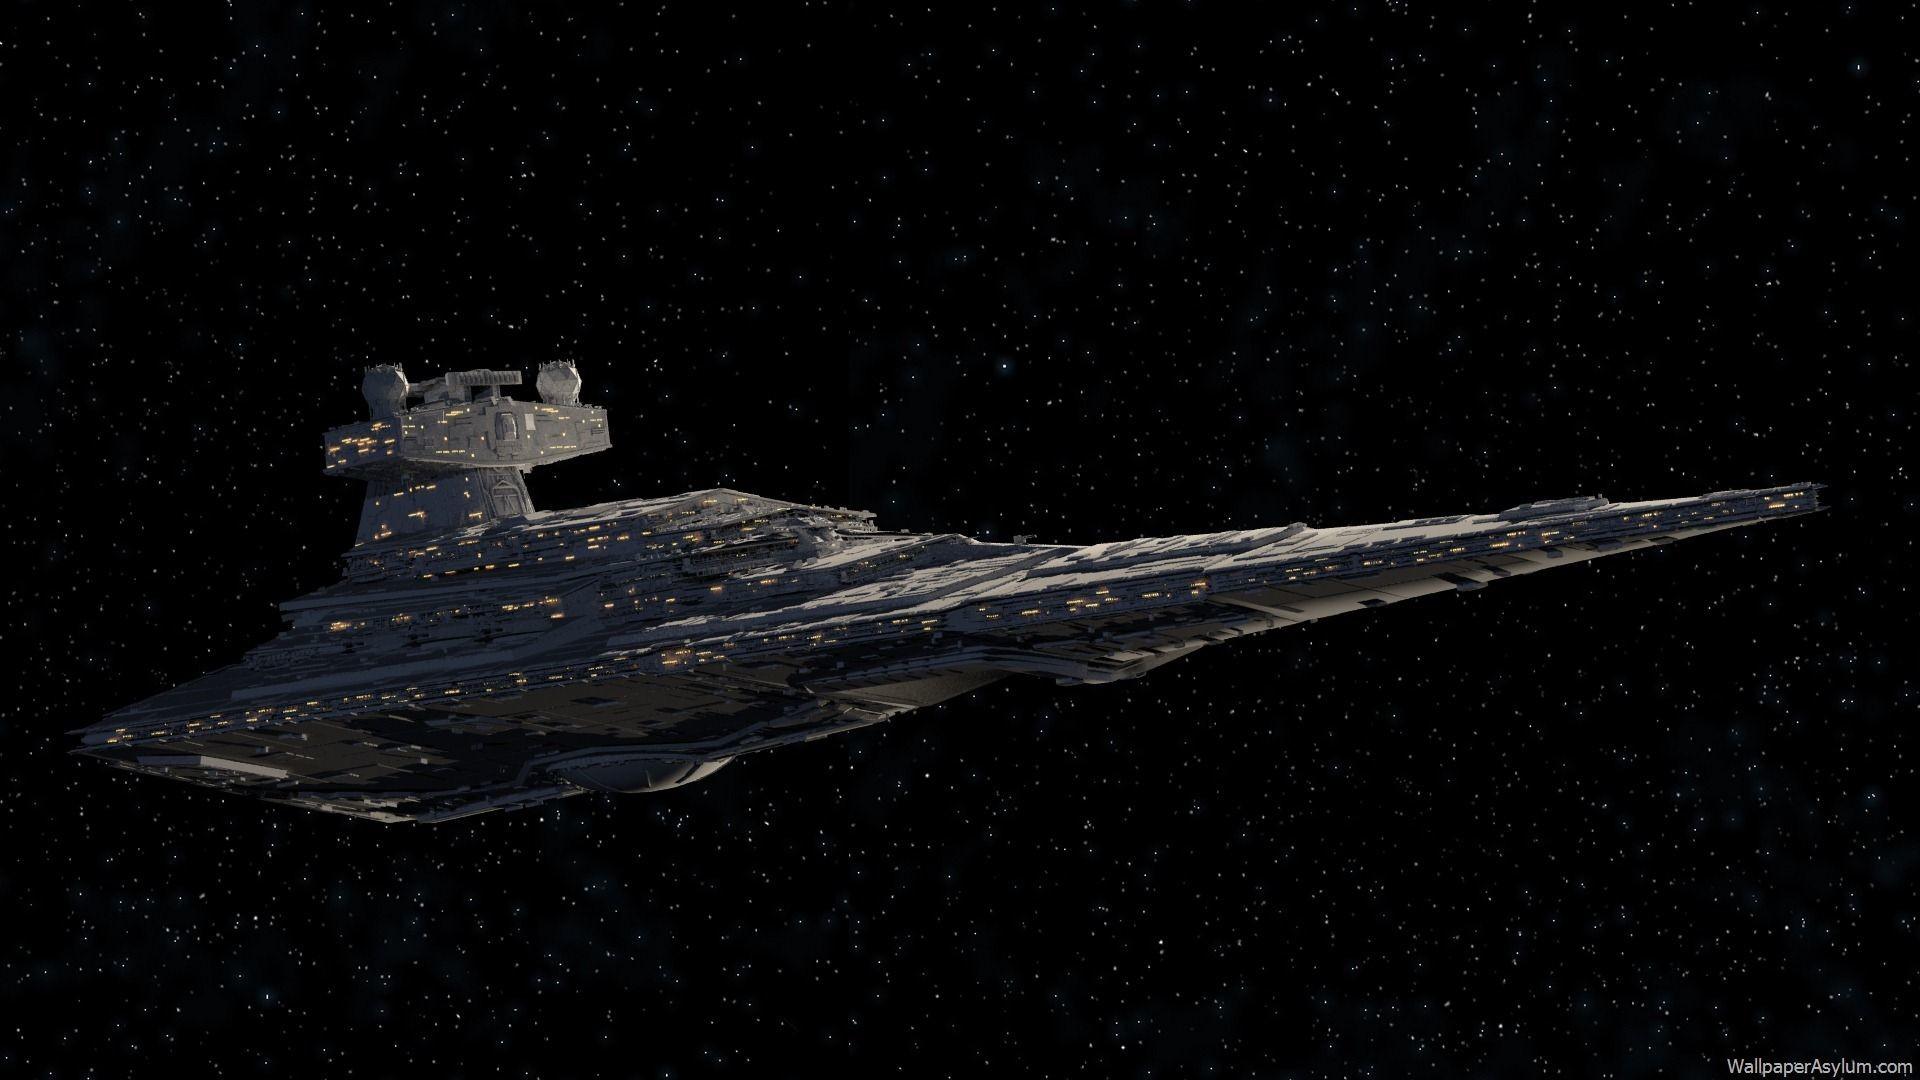 Images For > Star Destroyer Wallpaper Hd